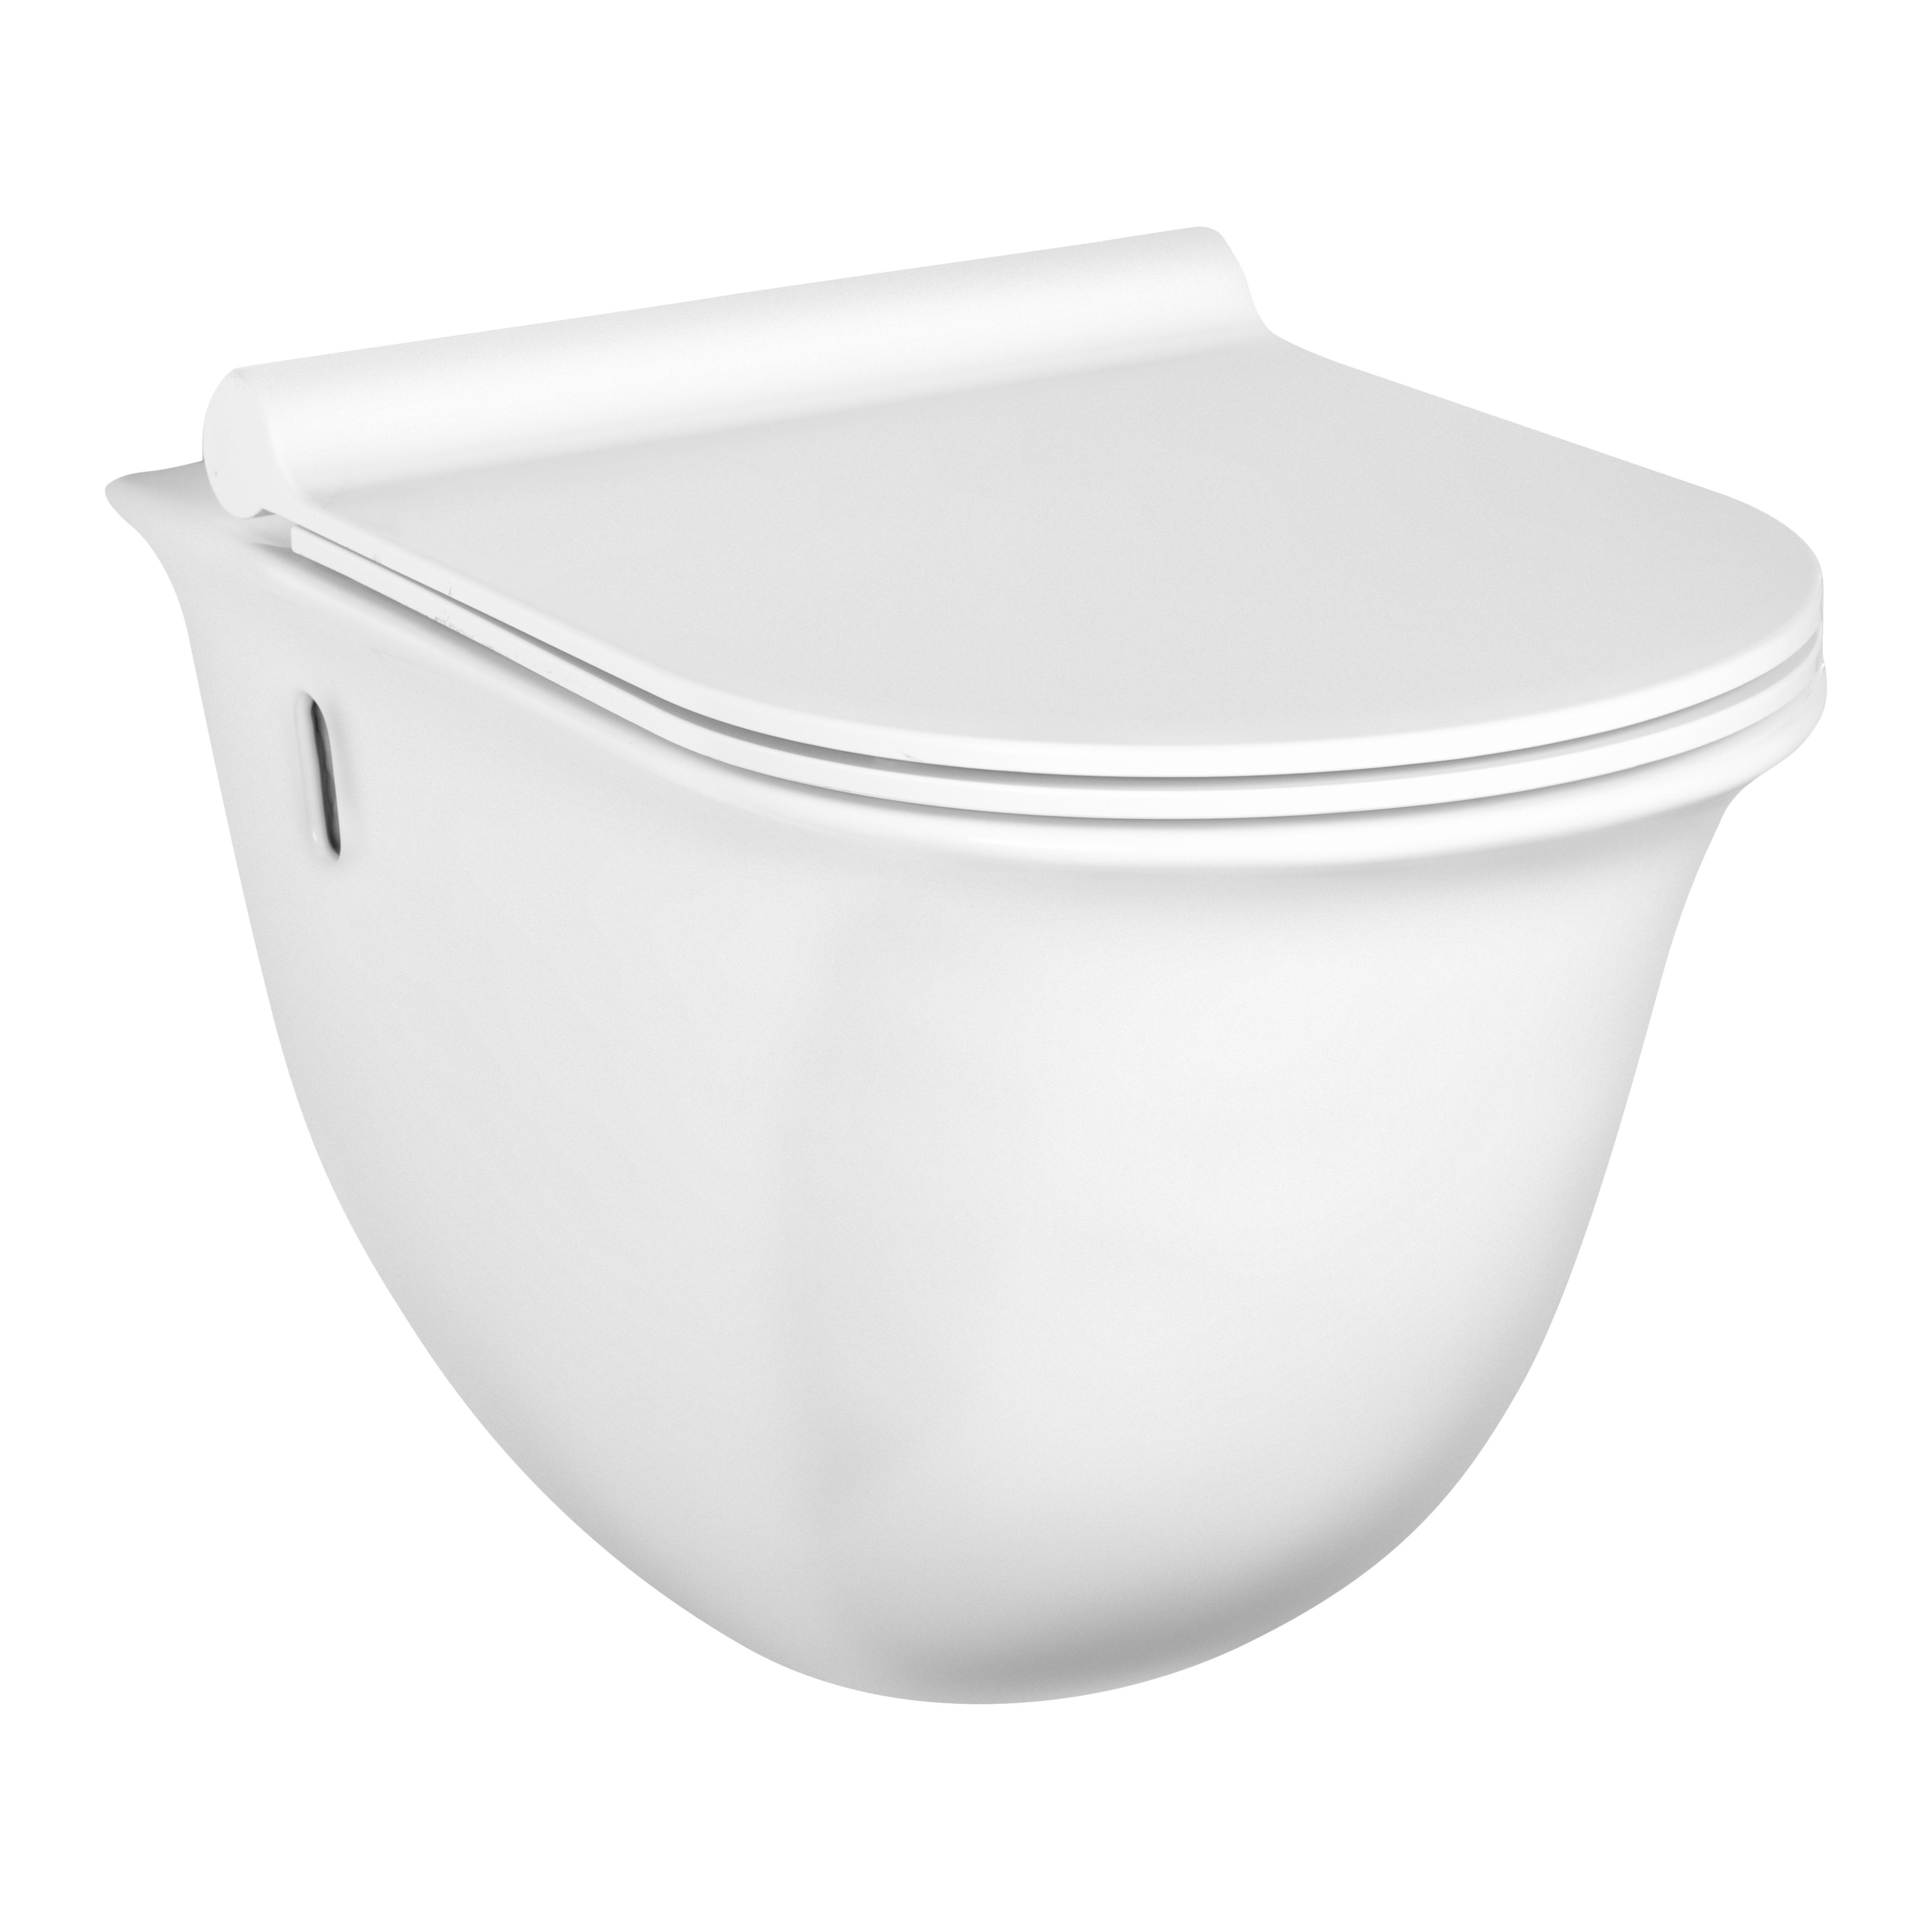 toilette wand wc keramik hängetoilette inkl. softclose wc-sitz